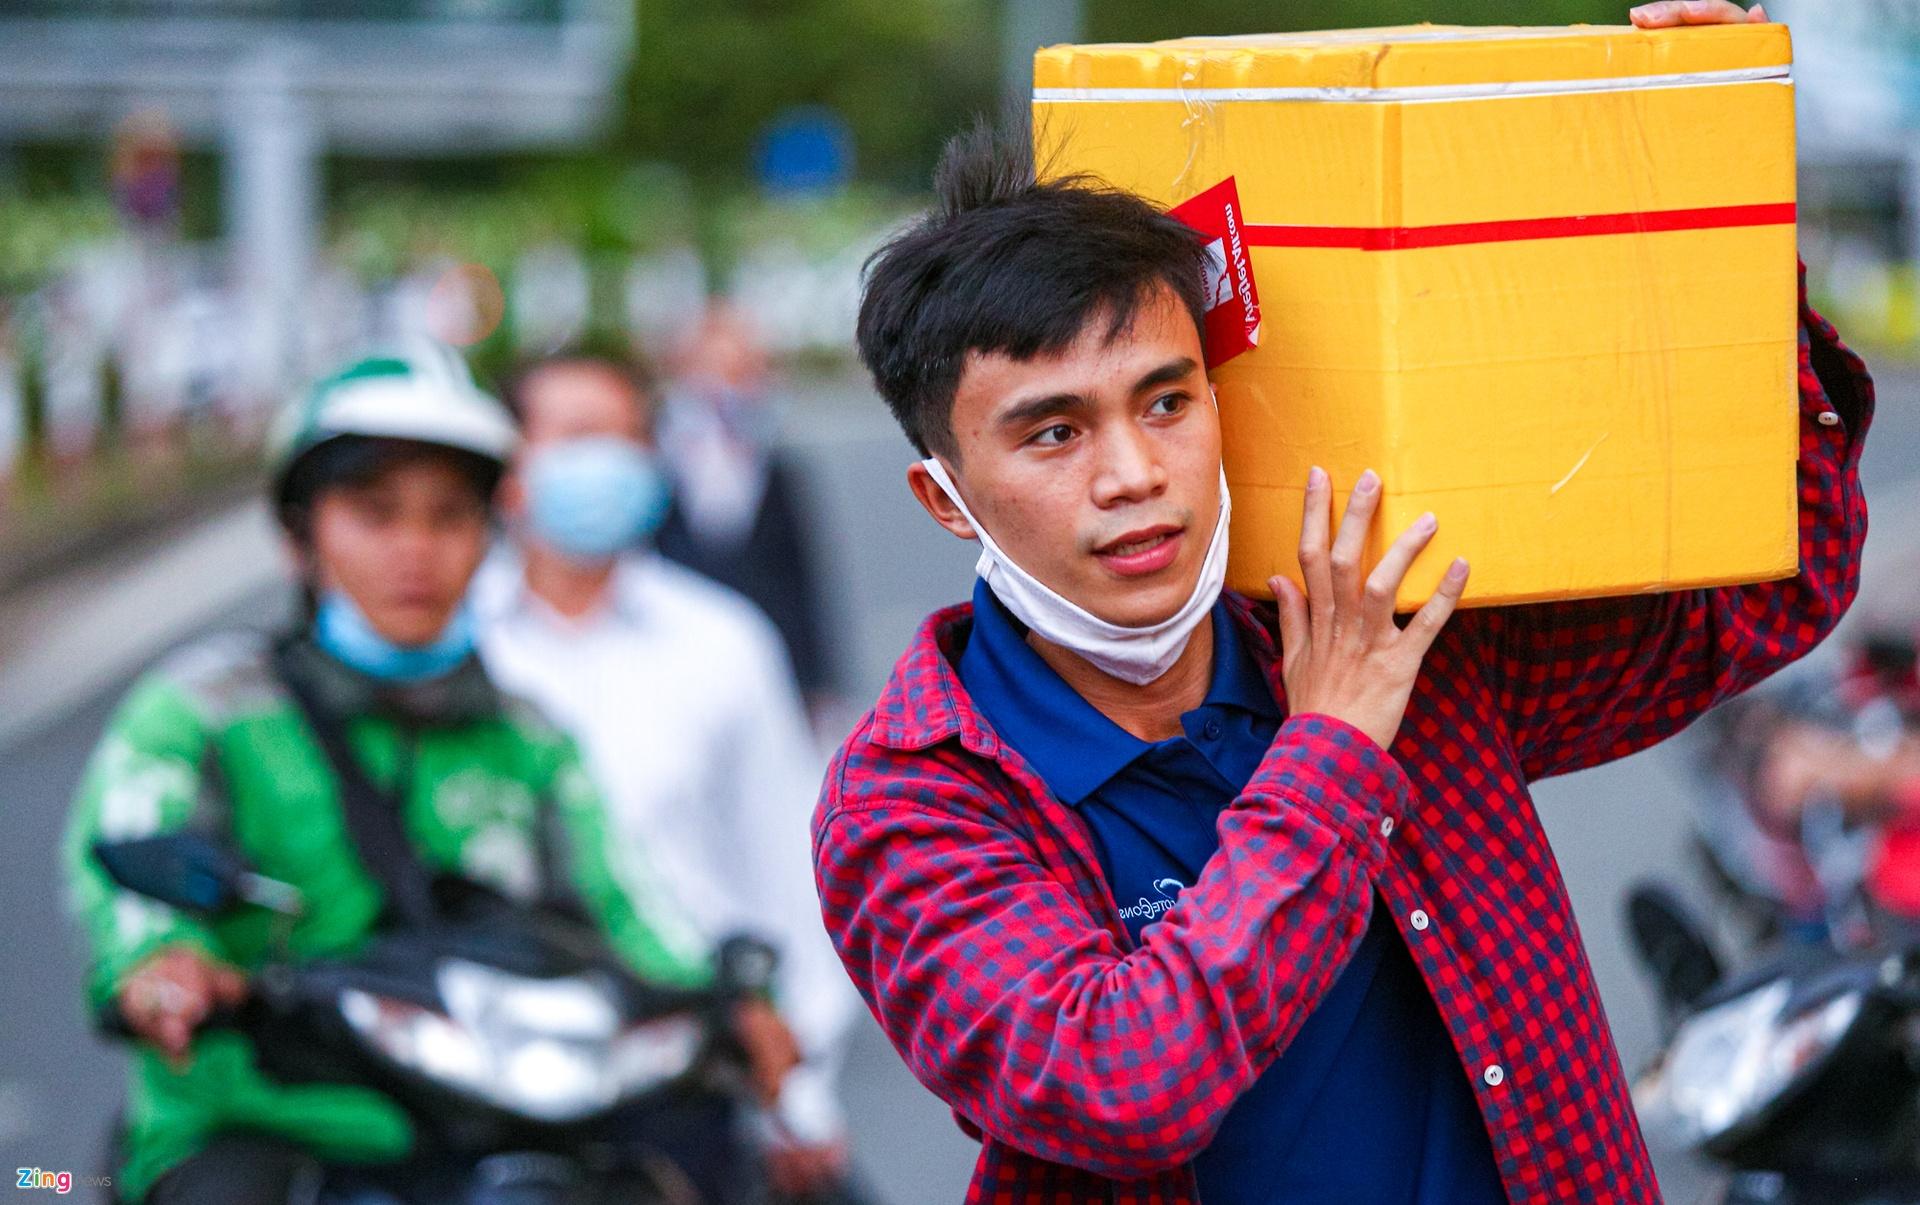 Khach doi nang don xe cong nghe o san bay Tan Son Nhat anh 8